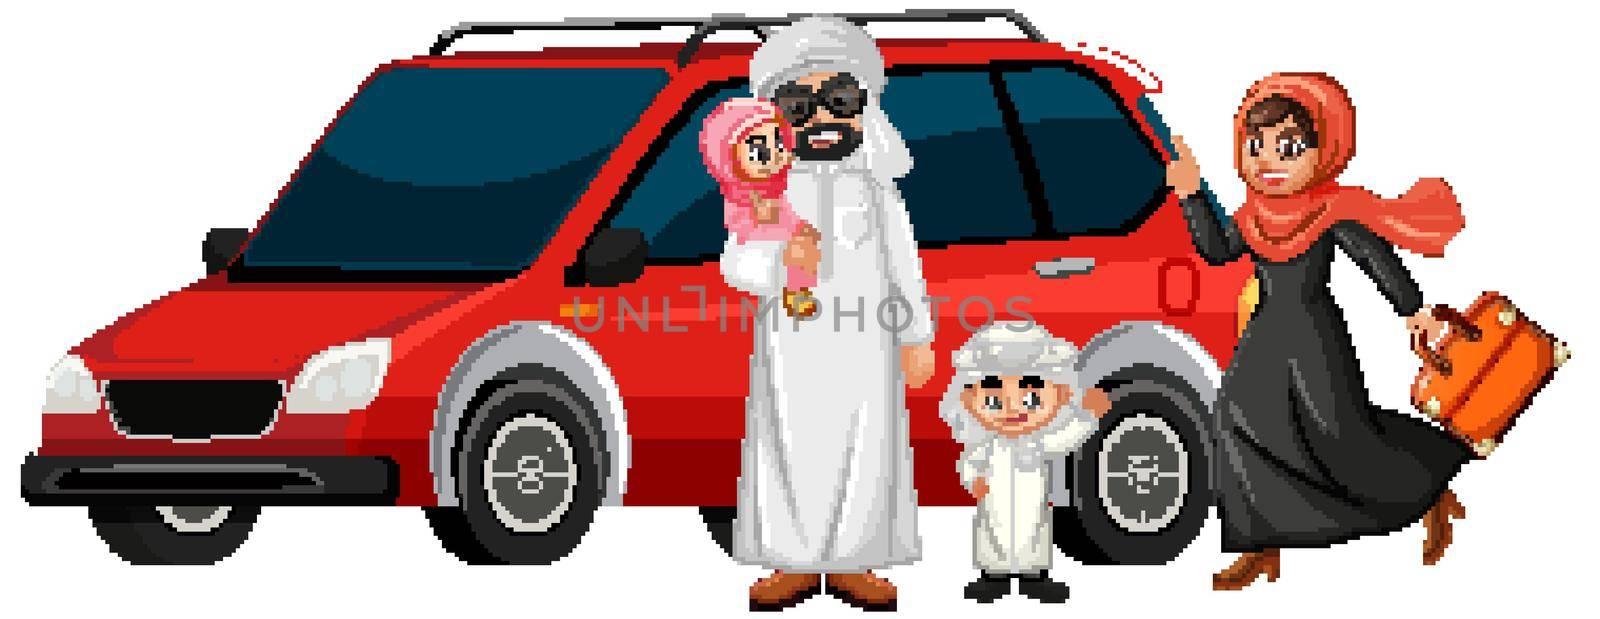 Arabian family on holiday illustration